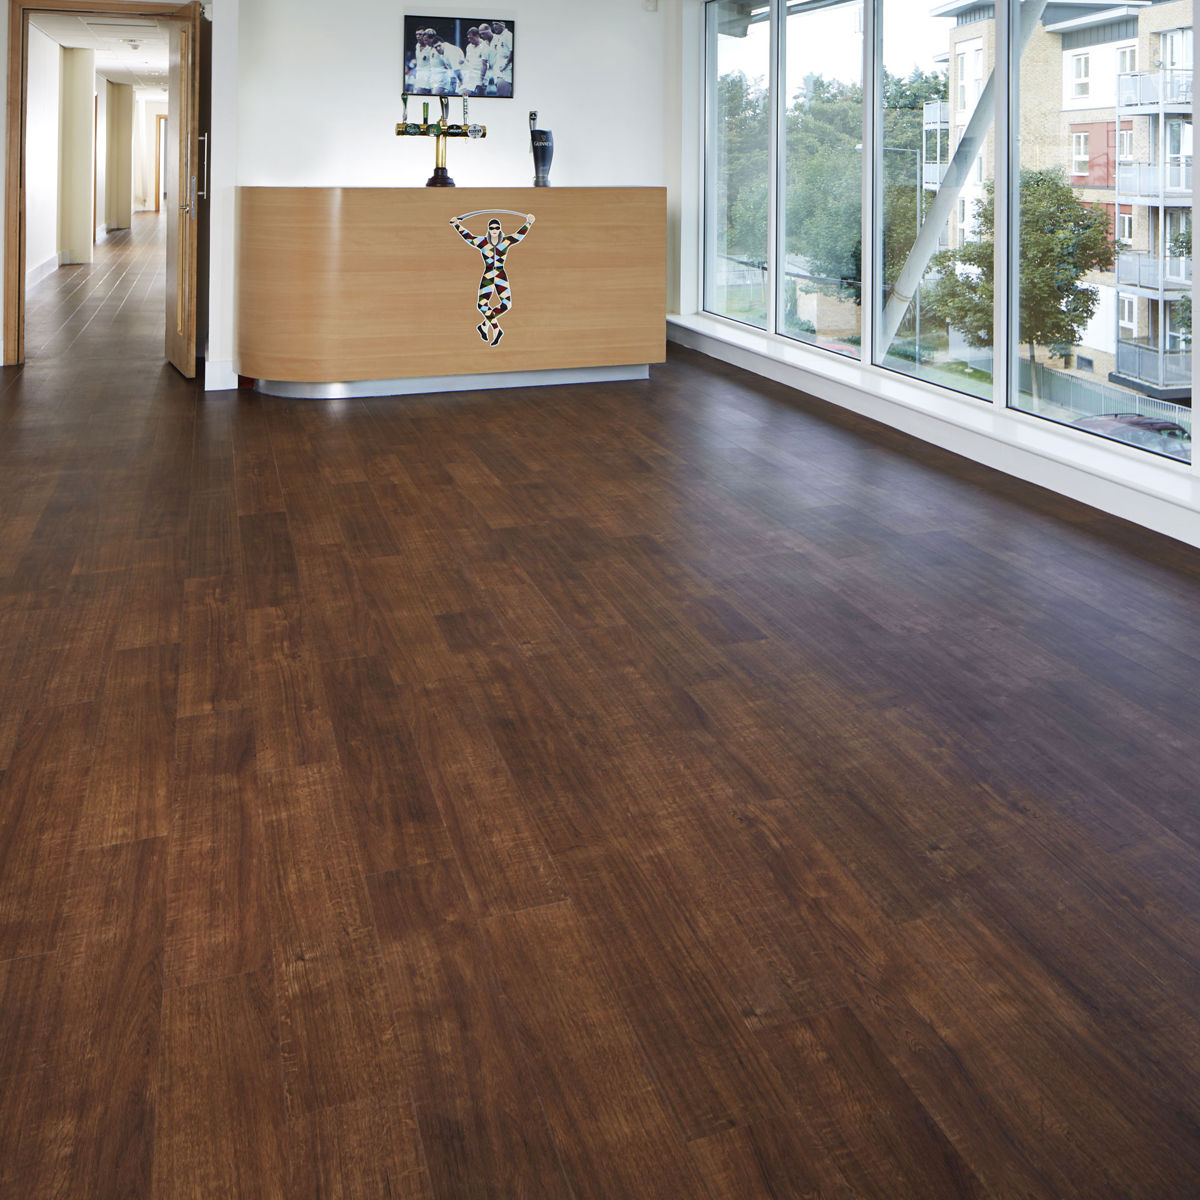 Vinyl Plank Flooring : Karndean opus rubra wp vinyl flooring